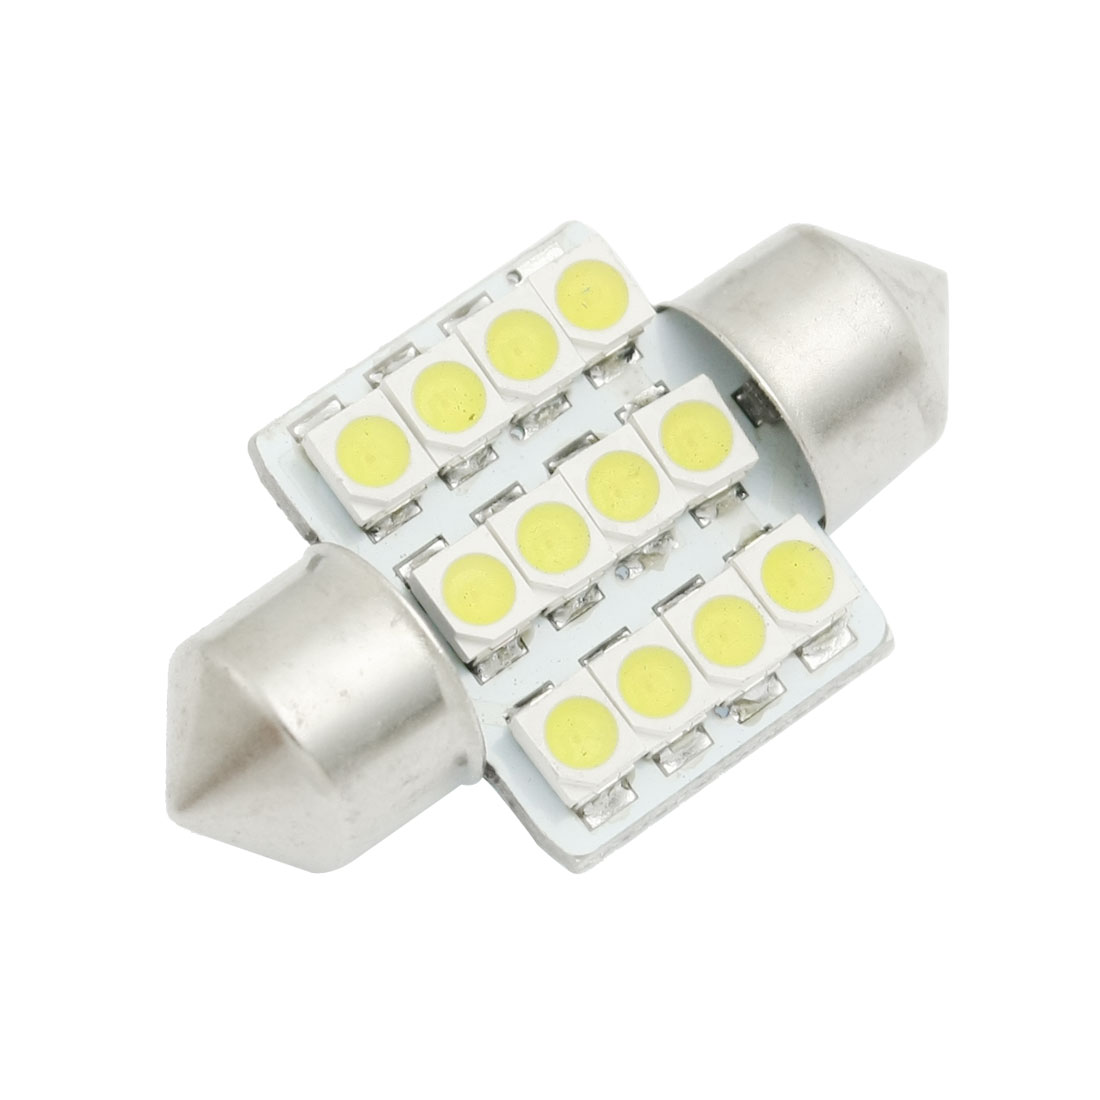 "White 1.25"" 31mm 12-SMD DE3175 DE3022 LED Bulbs For Car Dome Lights"